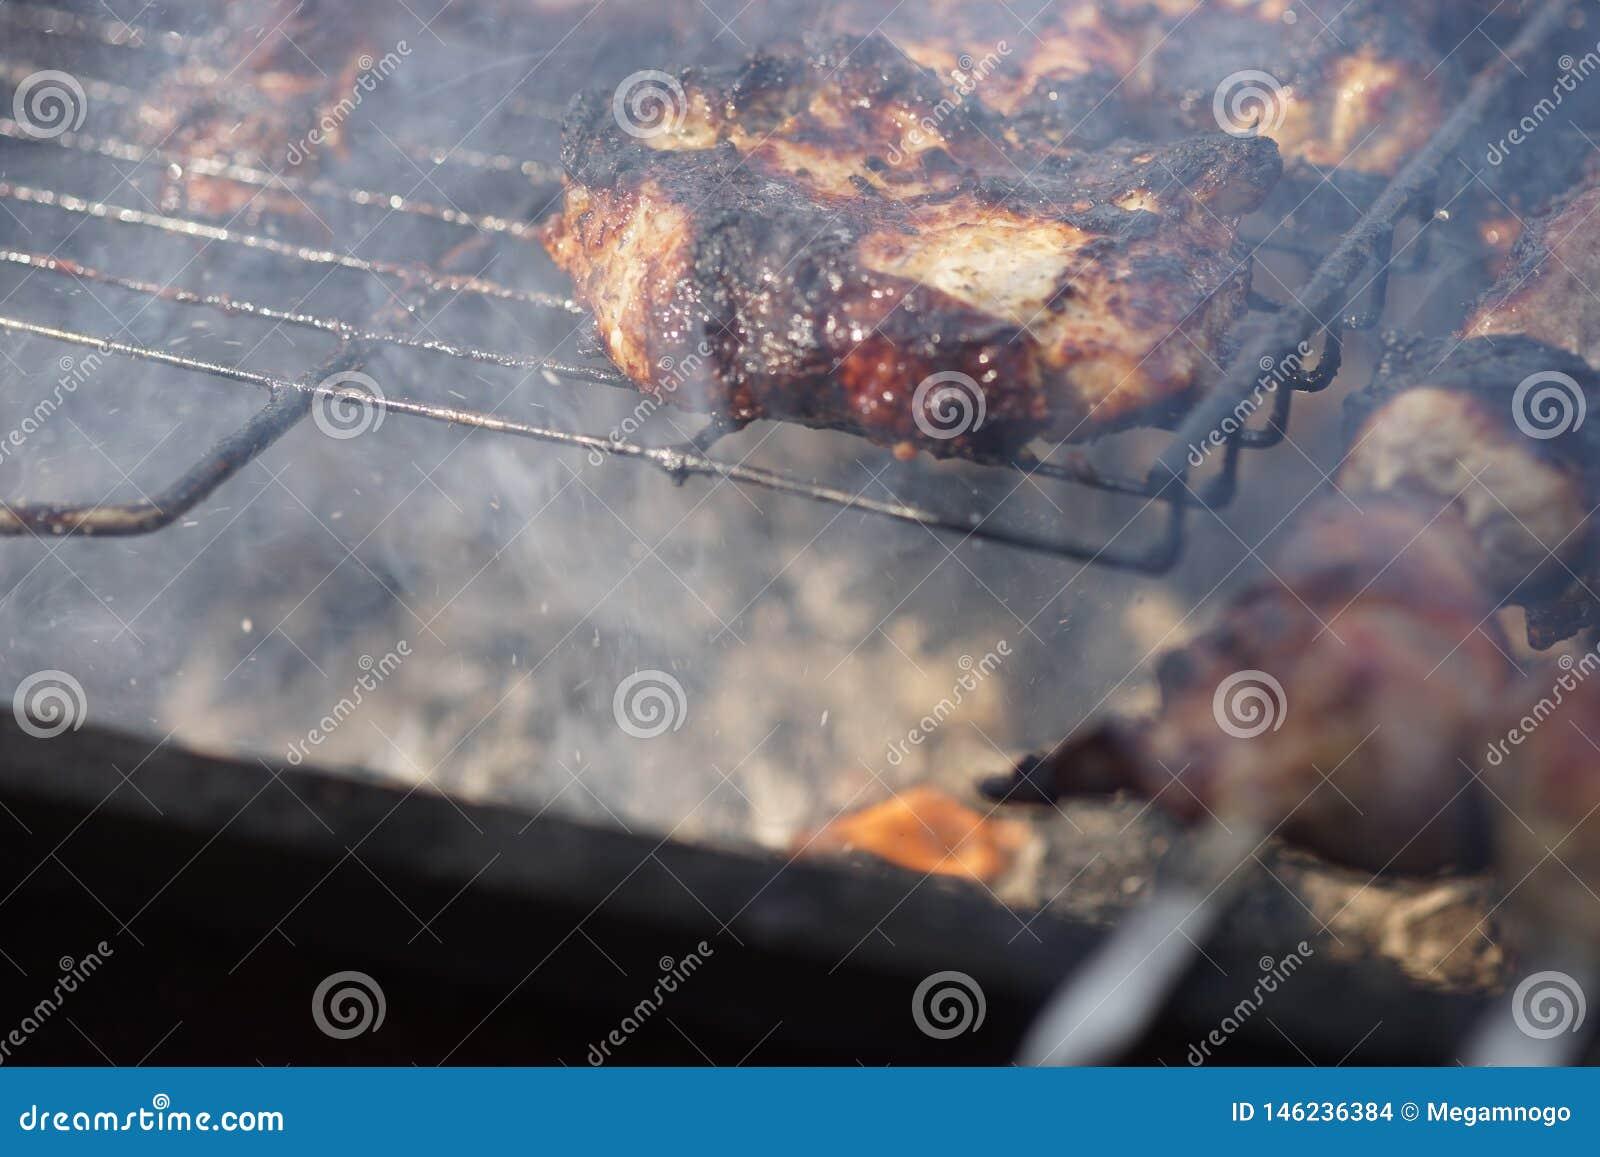 Grillad kebabmatlagning p? metallstekn?len E